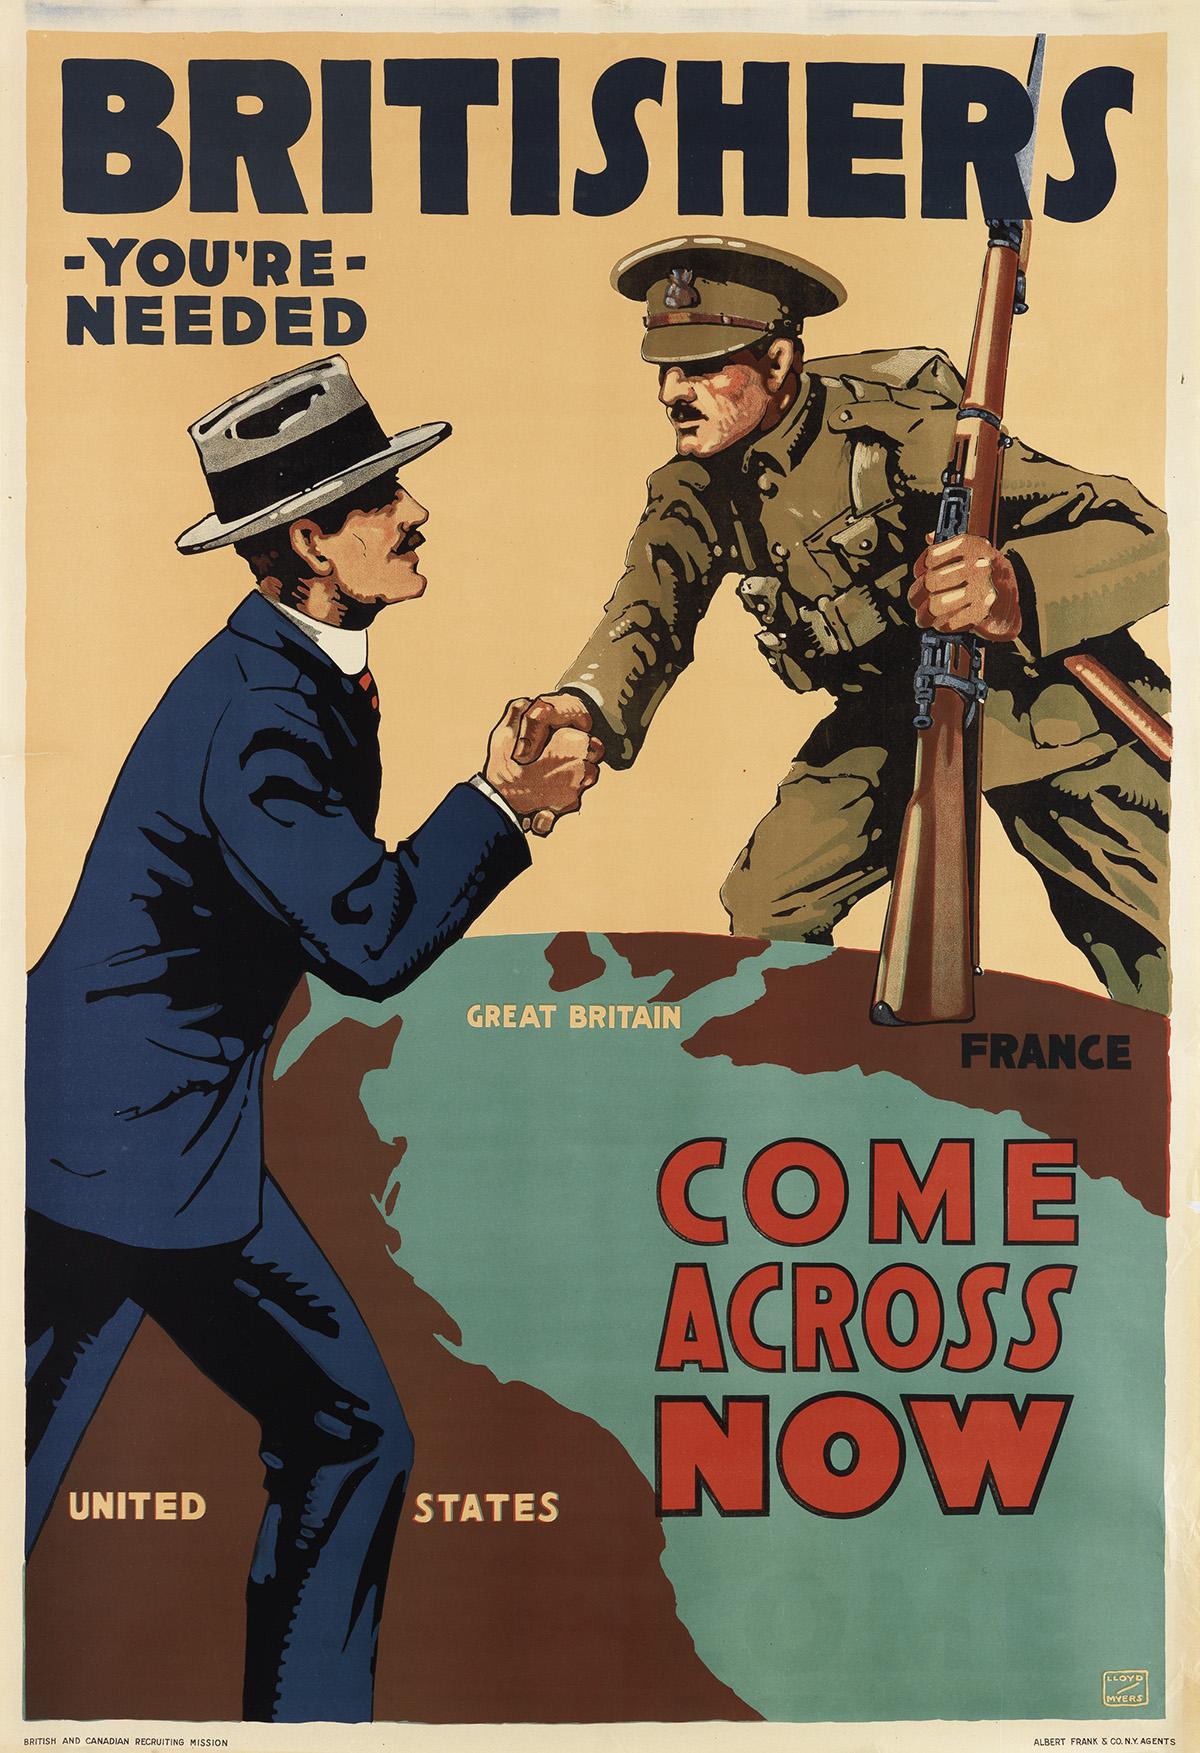 LLOYD-MYERS-(1882-1955)-BRITISHERS-YOURE-NEEDED--COME-ACROSS